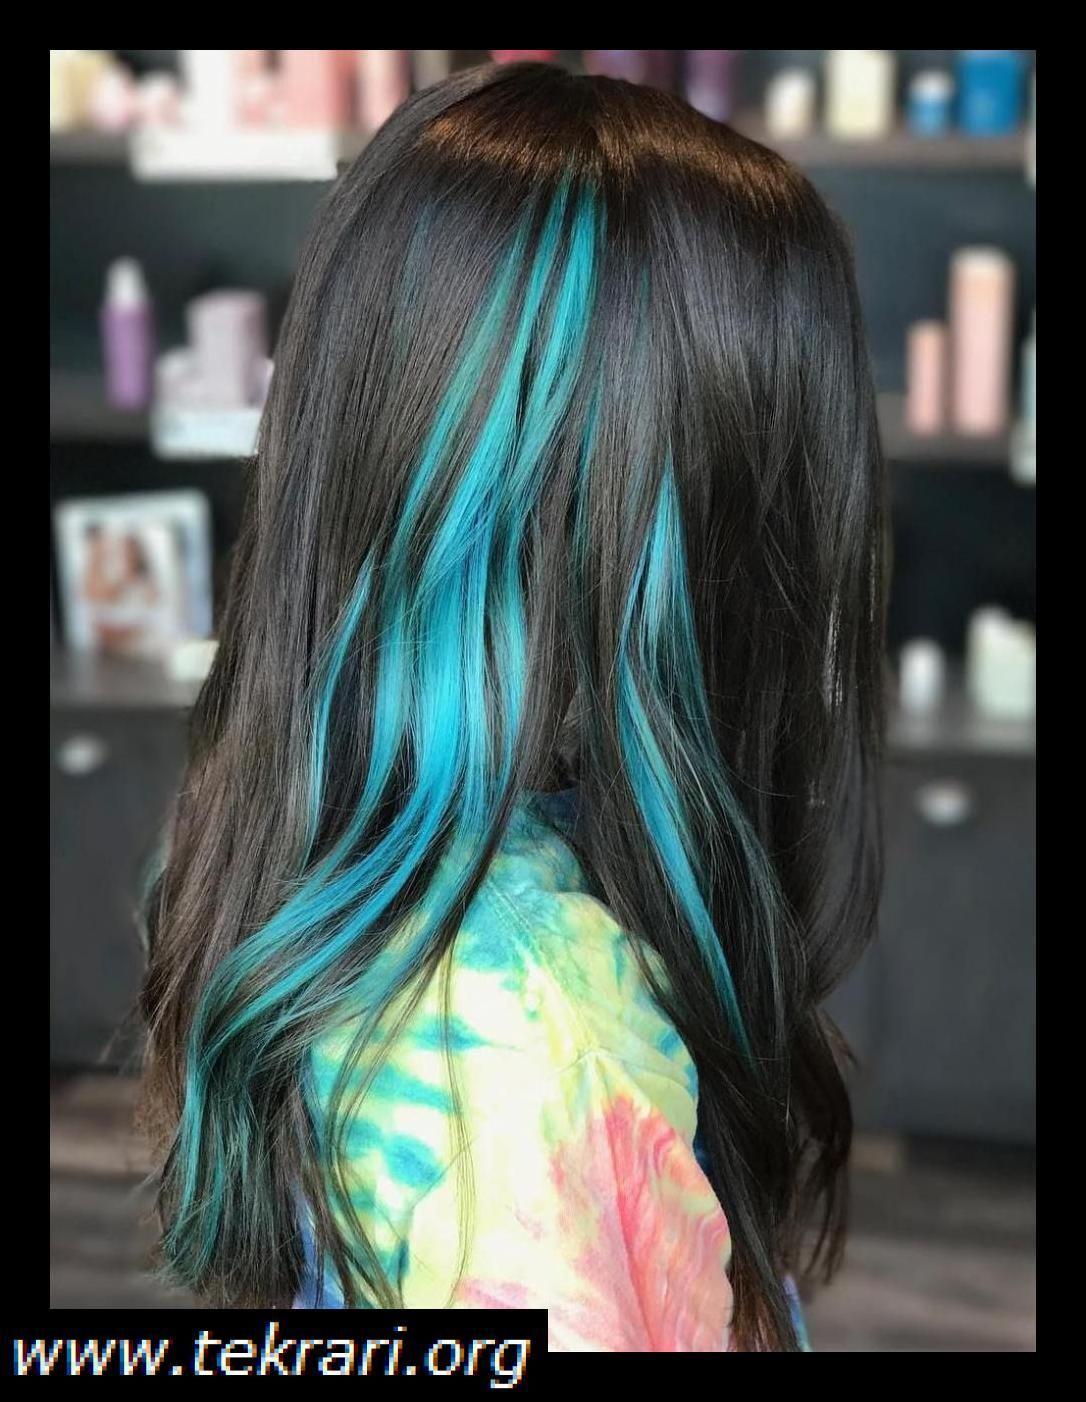 35 Captivating Peekaboo Highlights The Woman Hairstyles Blue Hair Highlights Blue Hair Color Highlights Blue Hair Streaks